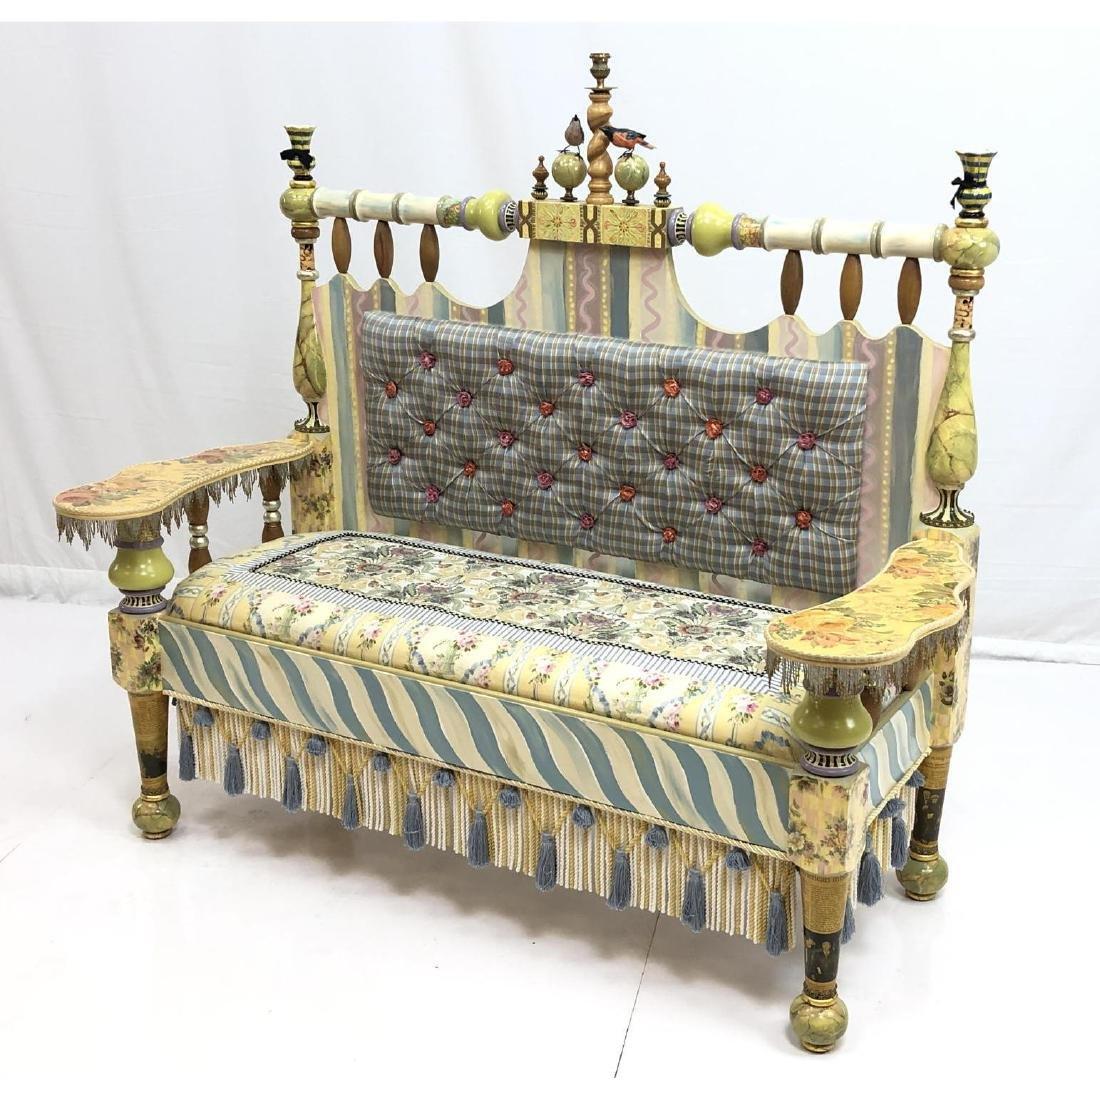 MACKENZIE CHILDS Handmade Painted Settee Couch. E